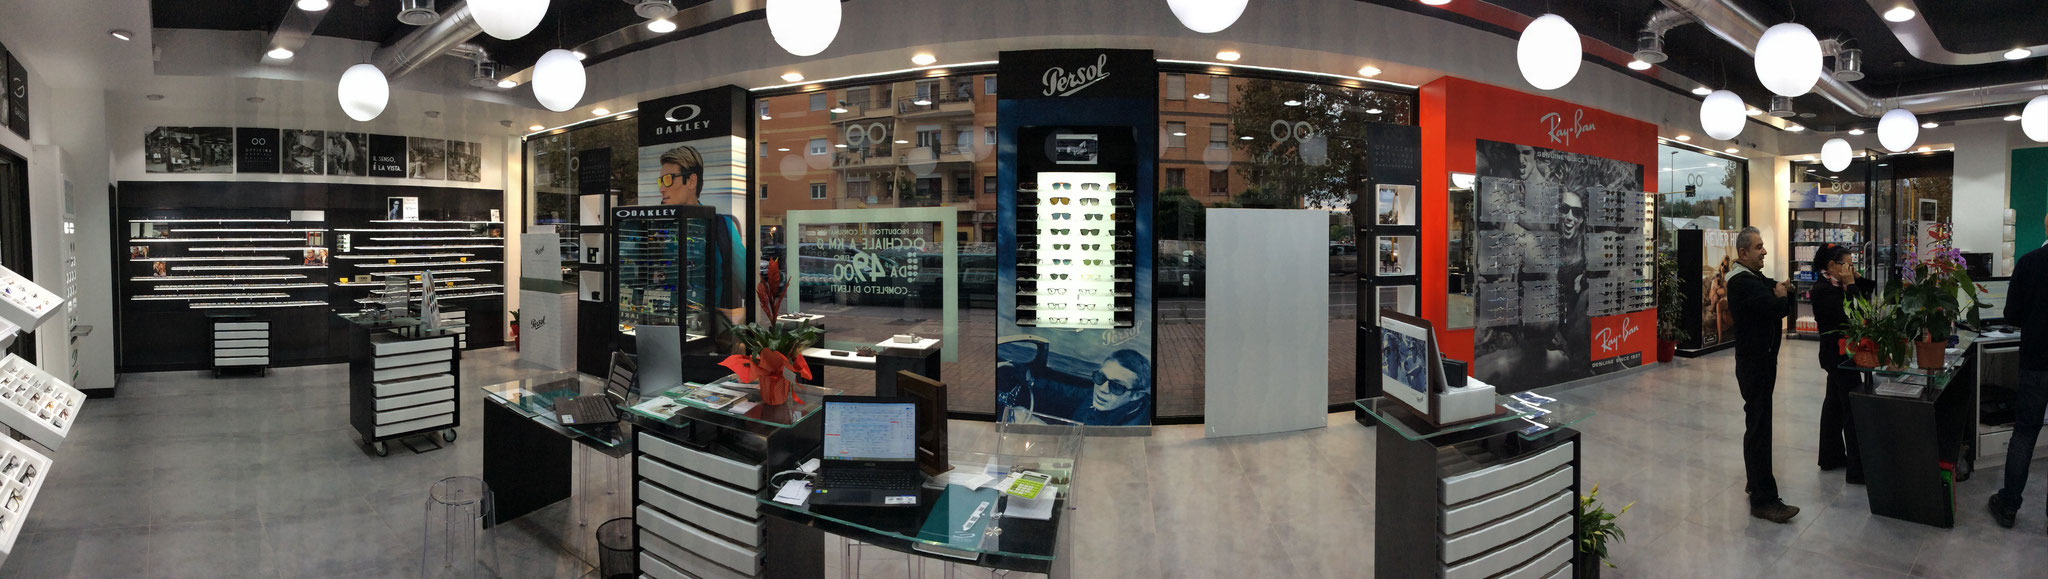 Restyling punto vendita - Officina occhiali Ostia